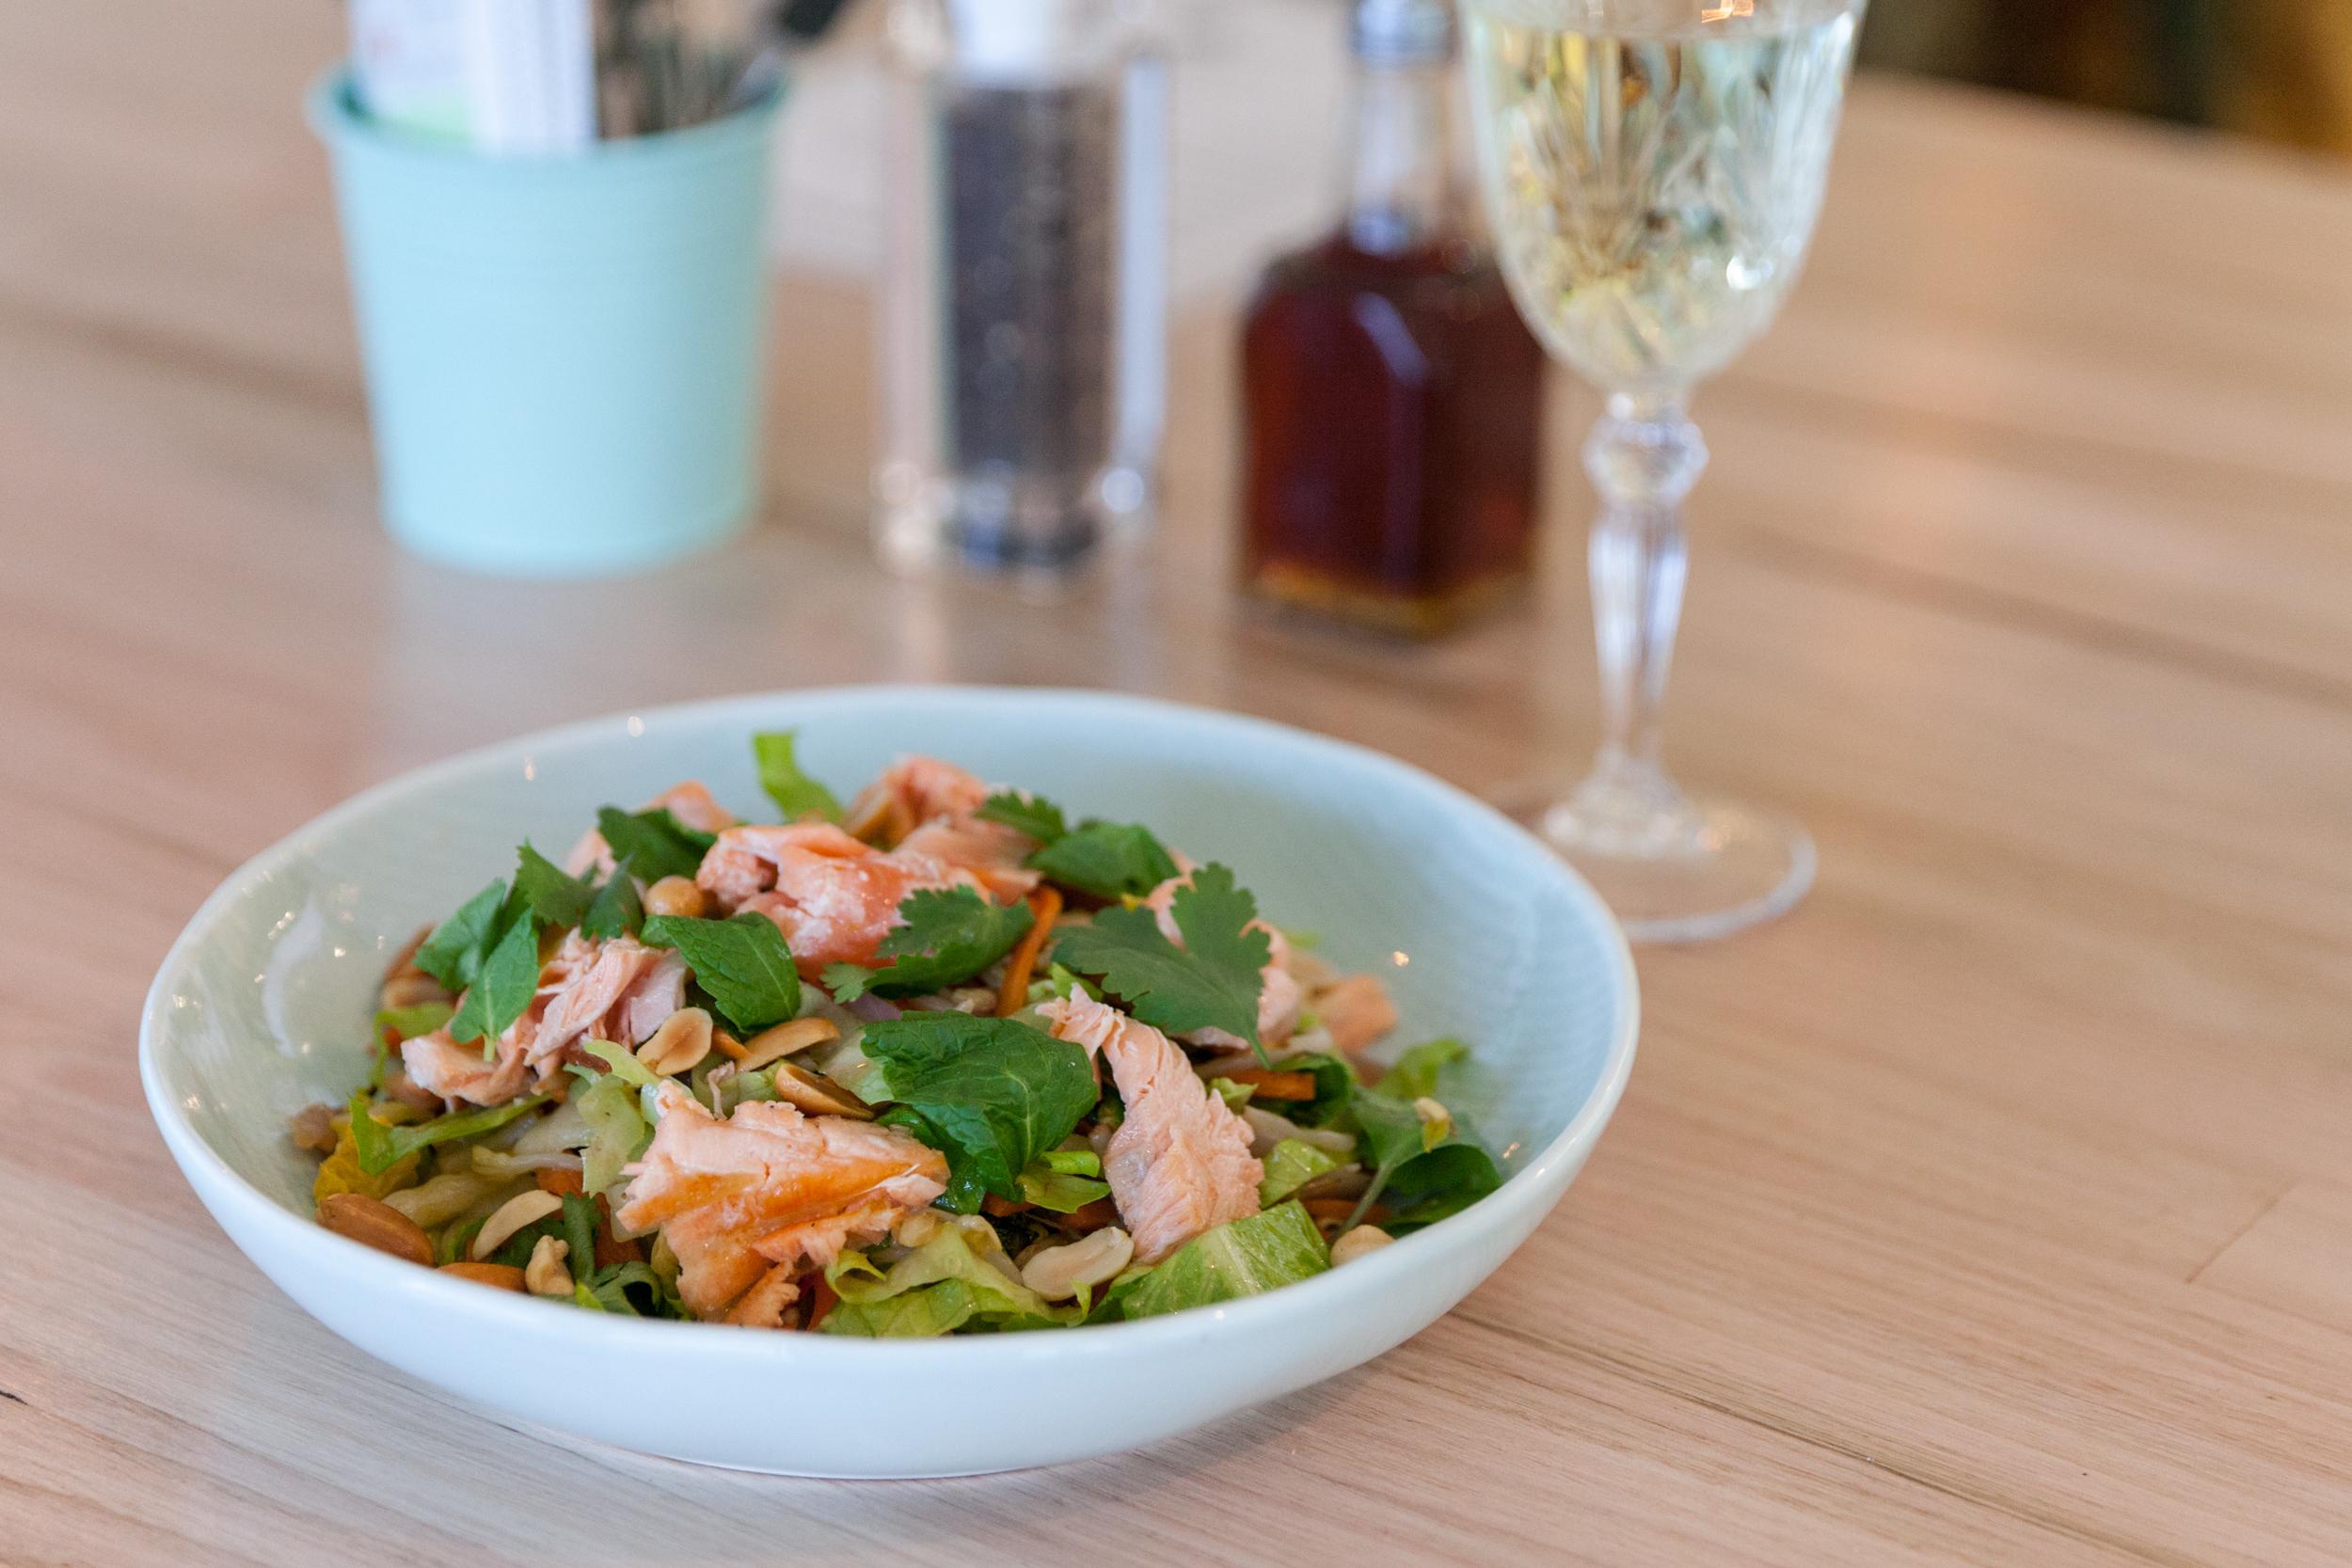 Vietnamese salmon salad bowl at Drunken Sailor